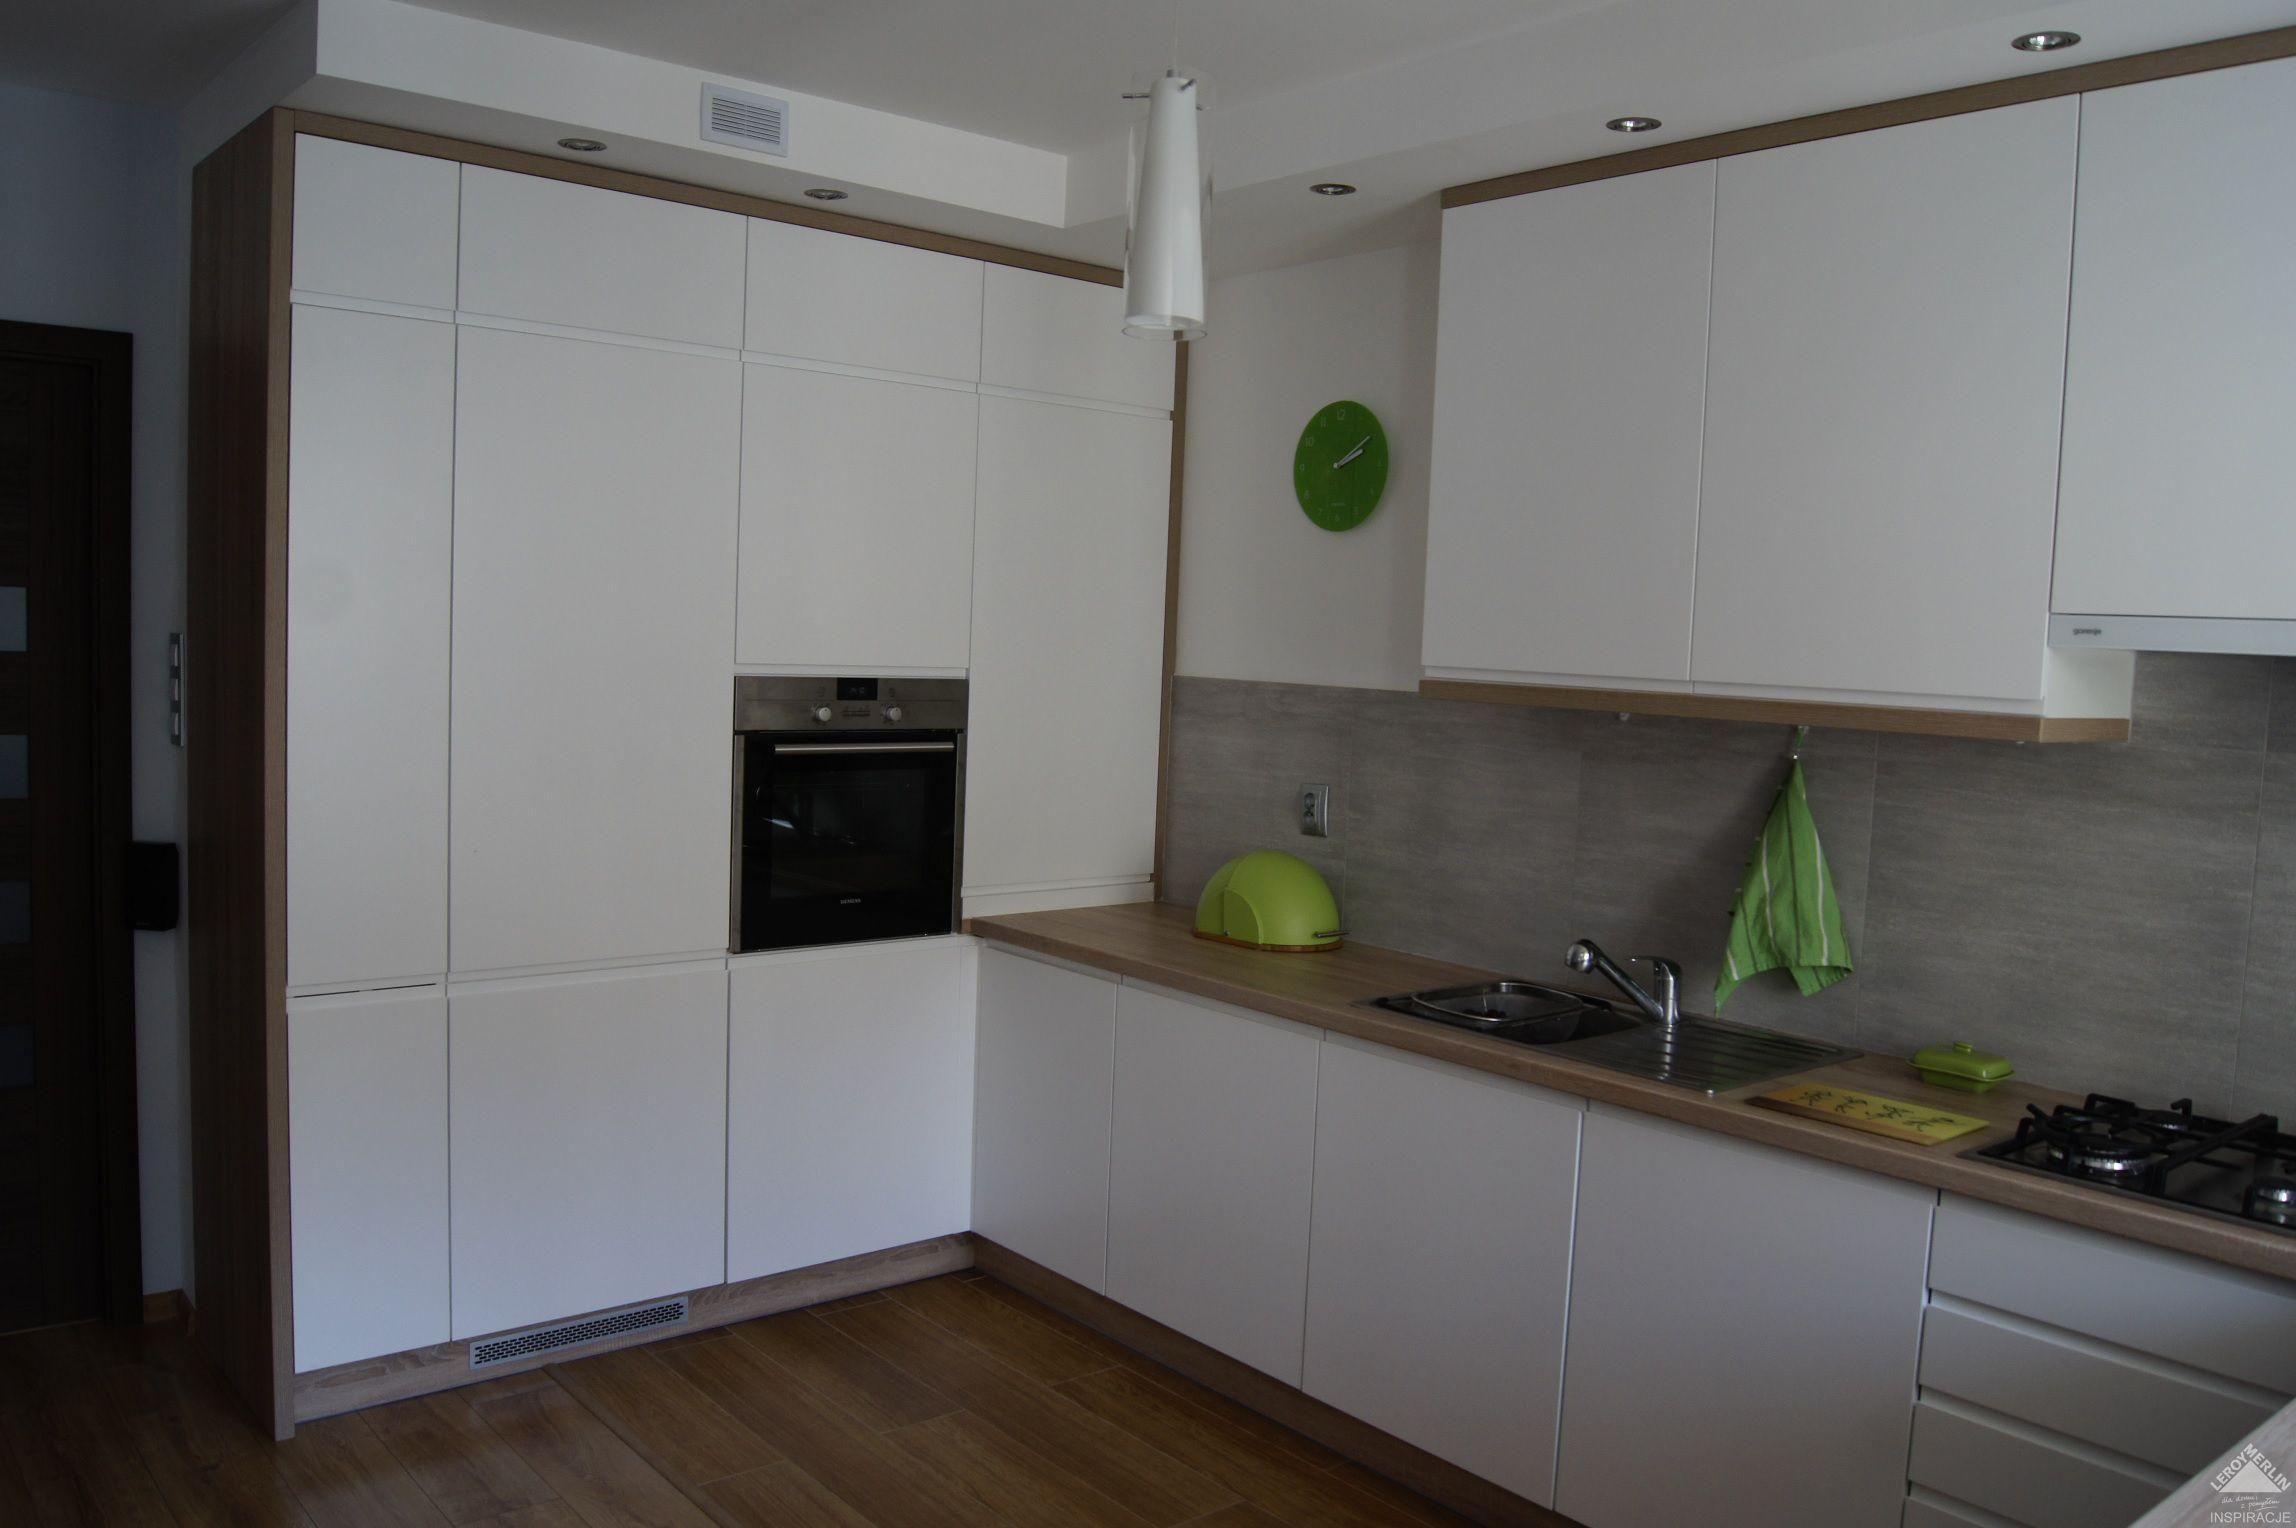 Okap W Kuchni Emama Forum Dyskusyjne Gazeta Pl Kitchen Design Kitchen Dining Room Home Decor